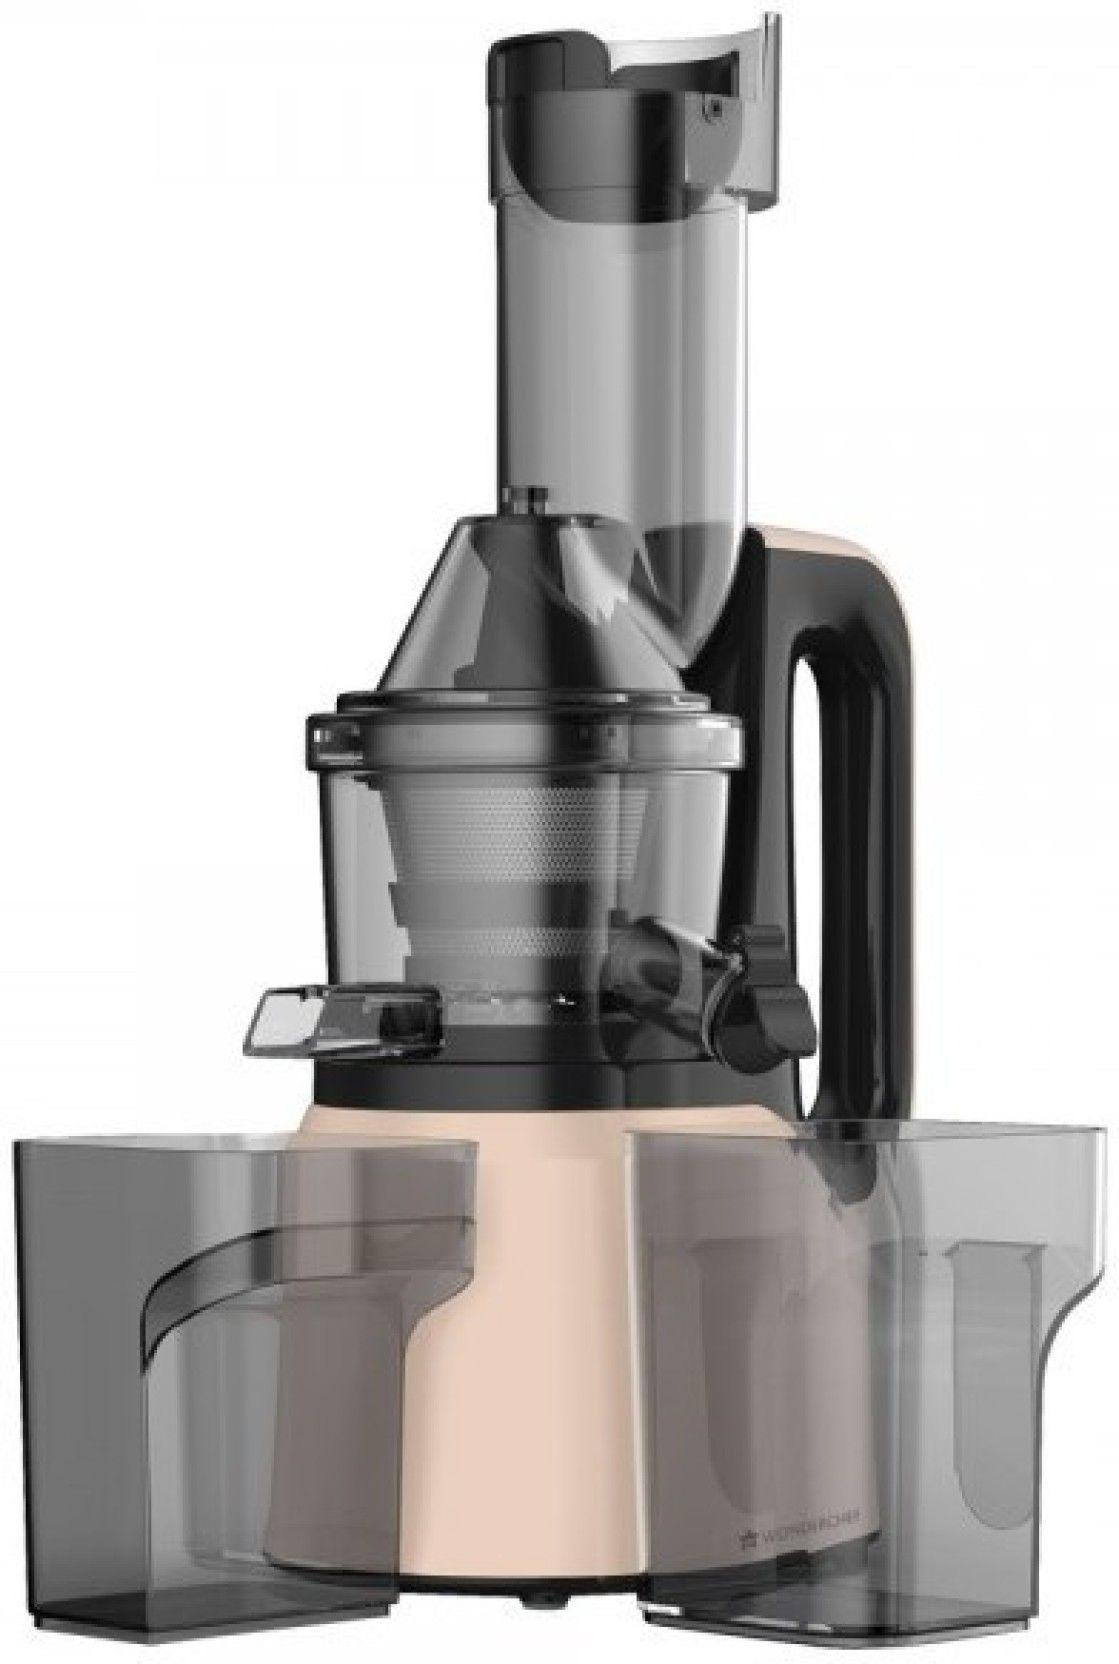 Wonderchef Cold Press Juicer Full Fruit Plastic Hand Juicer Price in ...